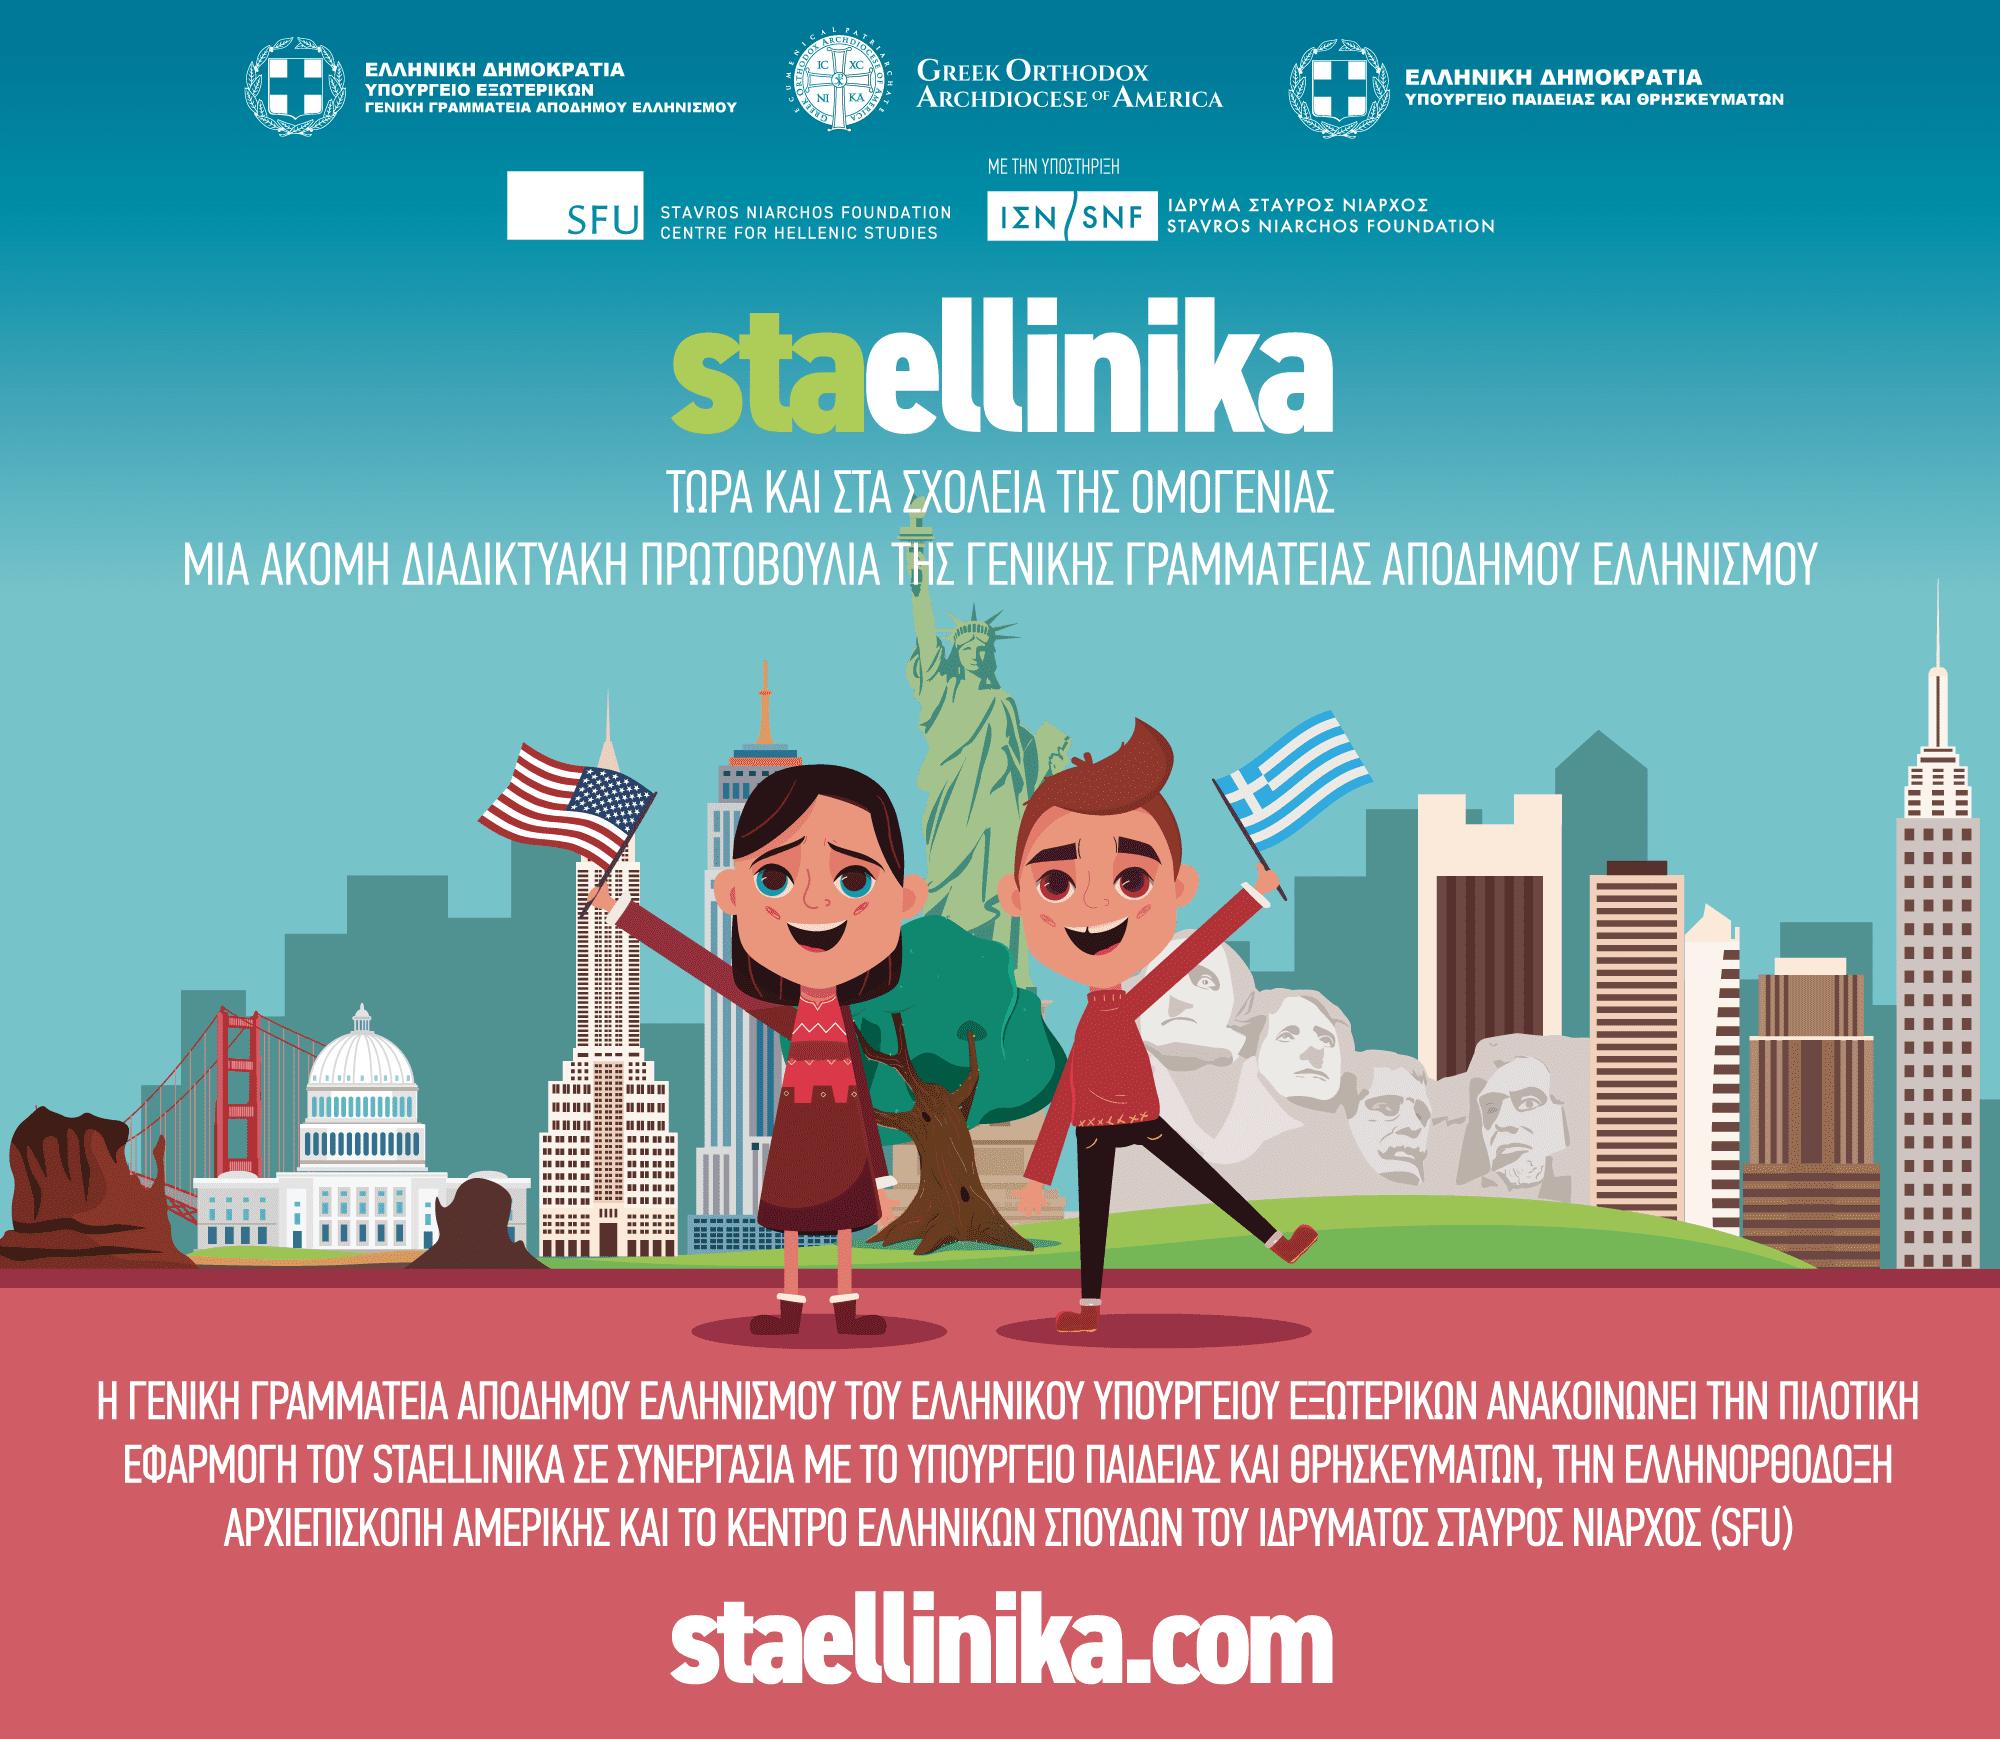 StaEllinika: H πλατφόρμα εκμάθησης της ελληνικής γλώσσας σε σχολεία της Αρχιεπισκοπής Αμερικής